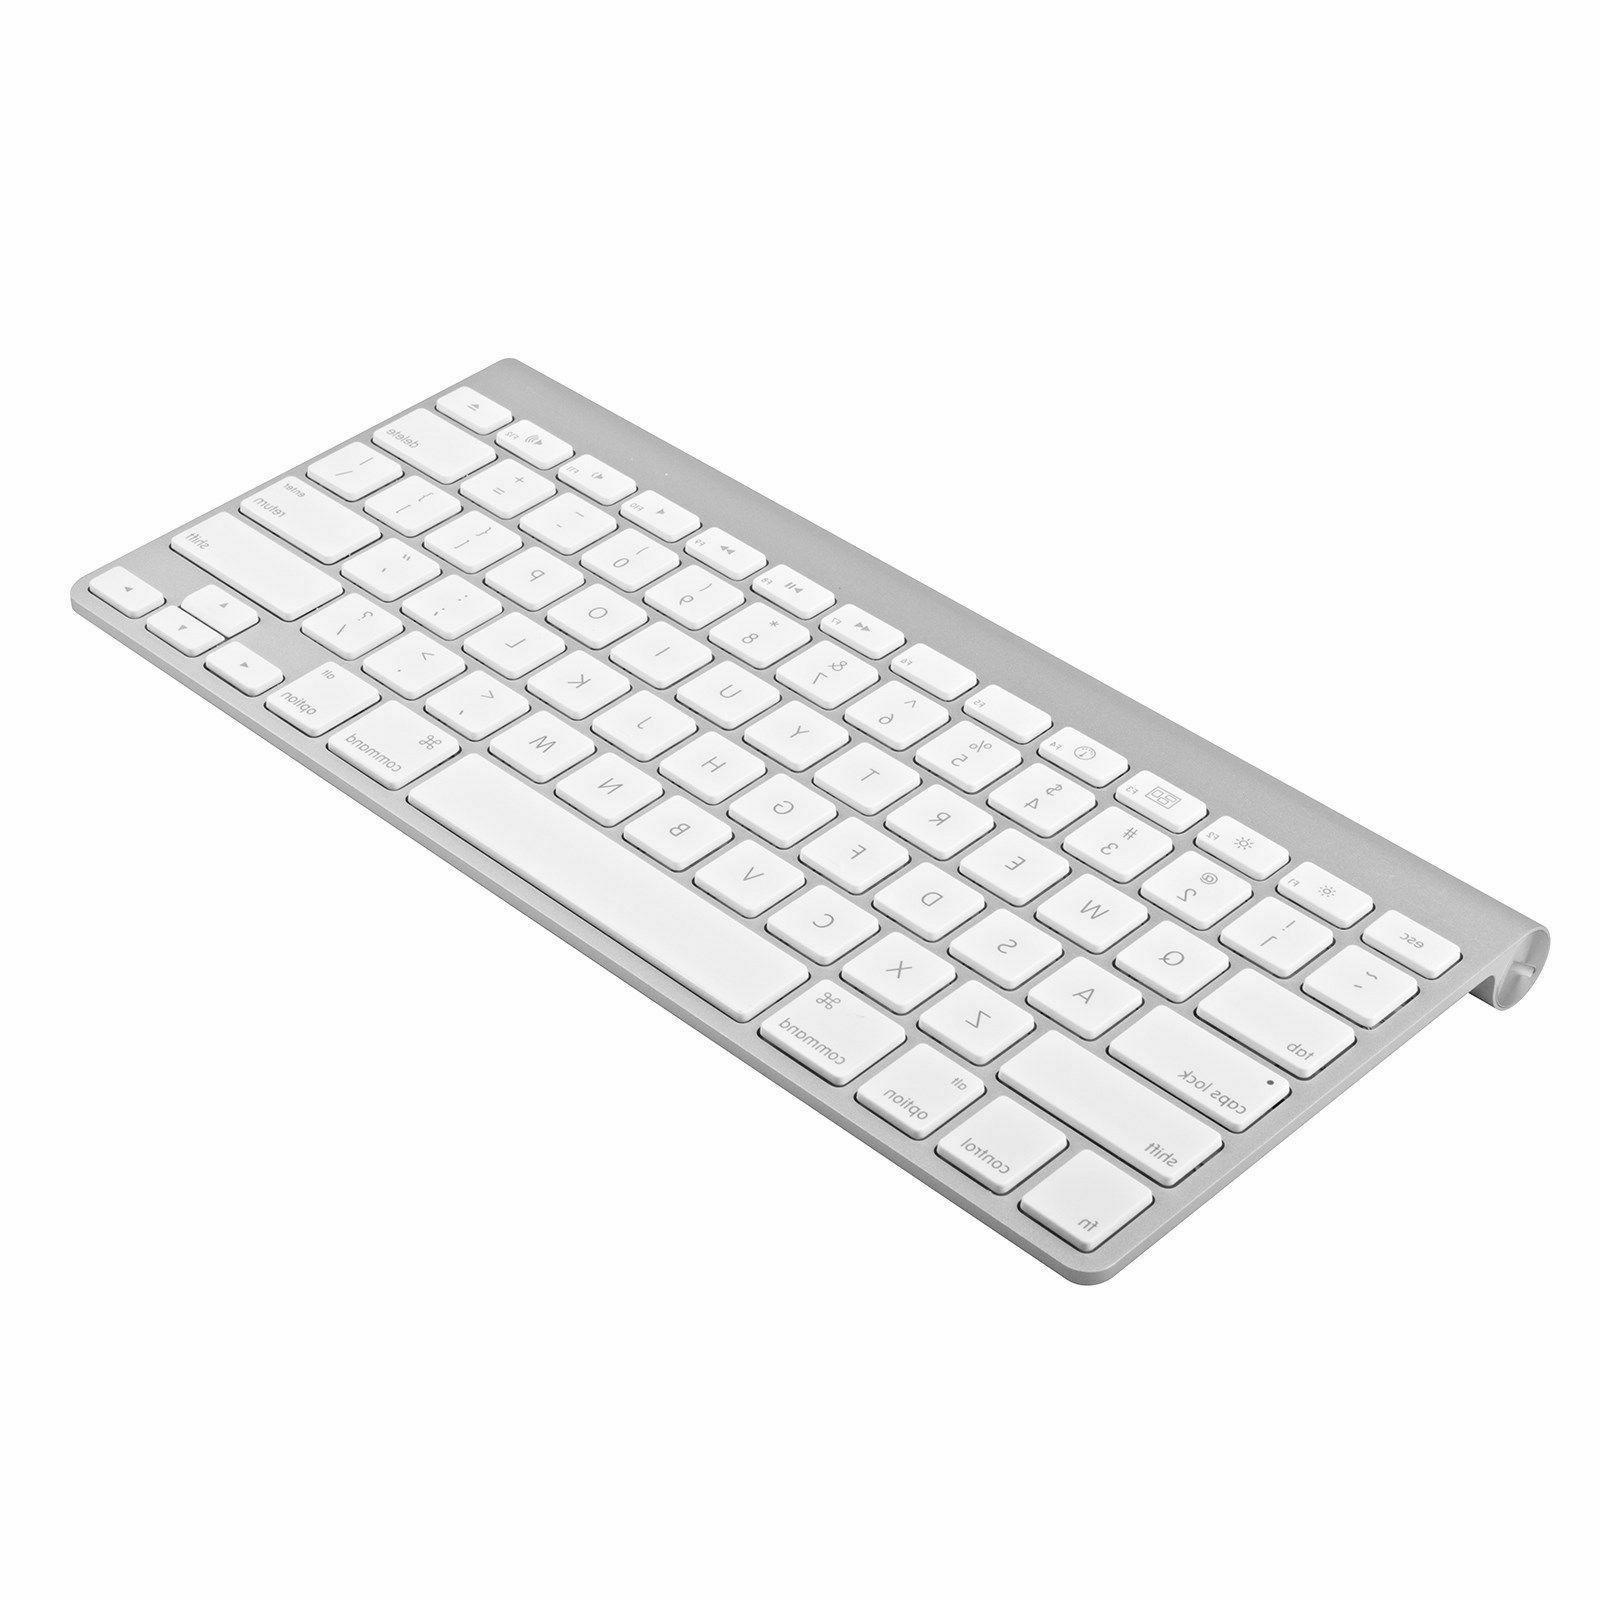 bluetooth anodized aluminum keyboard mc184ll a wireless